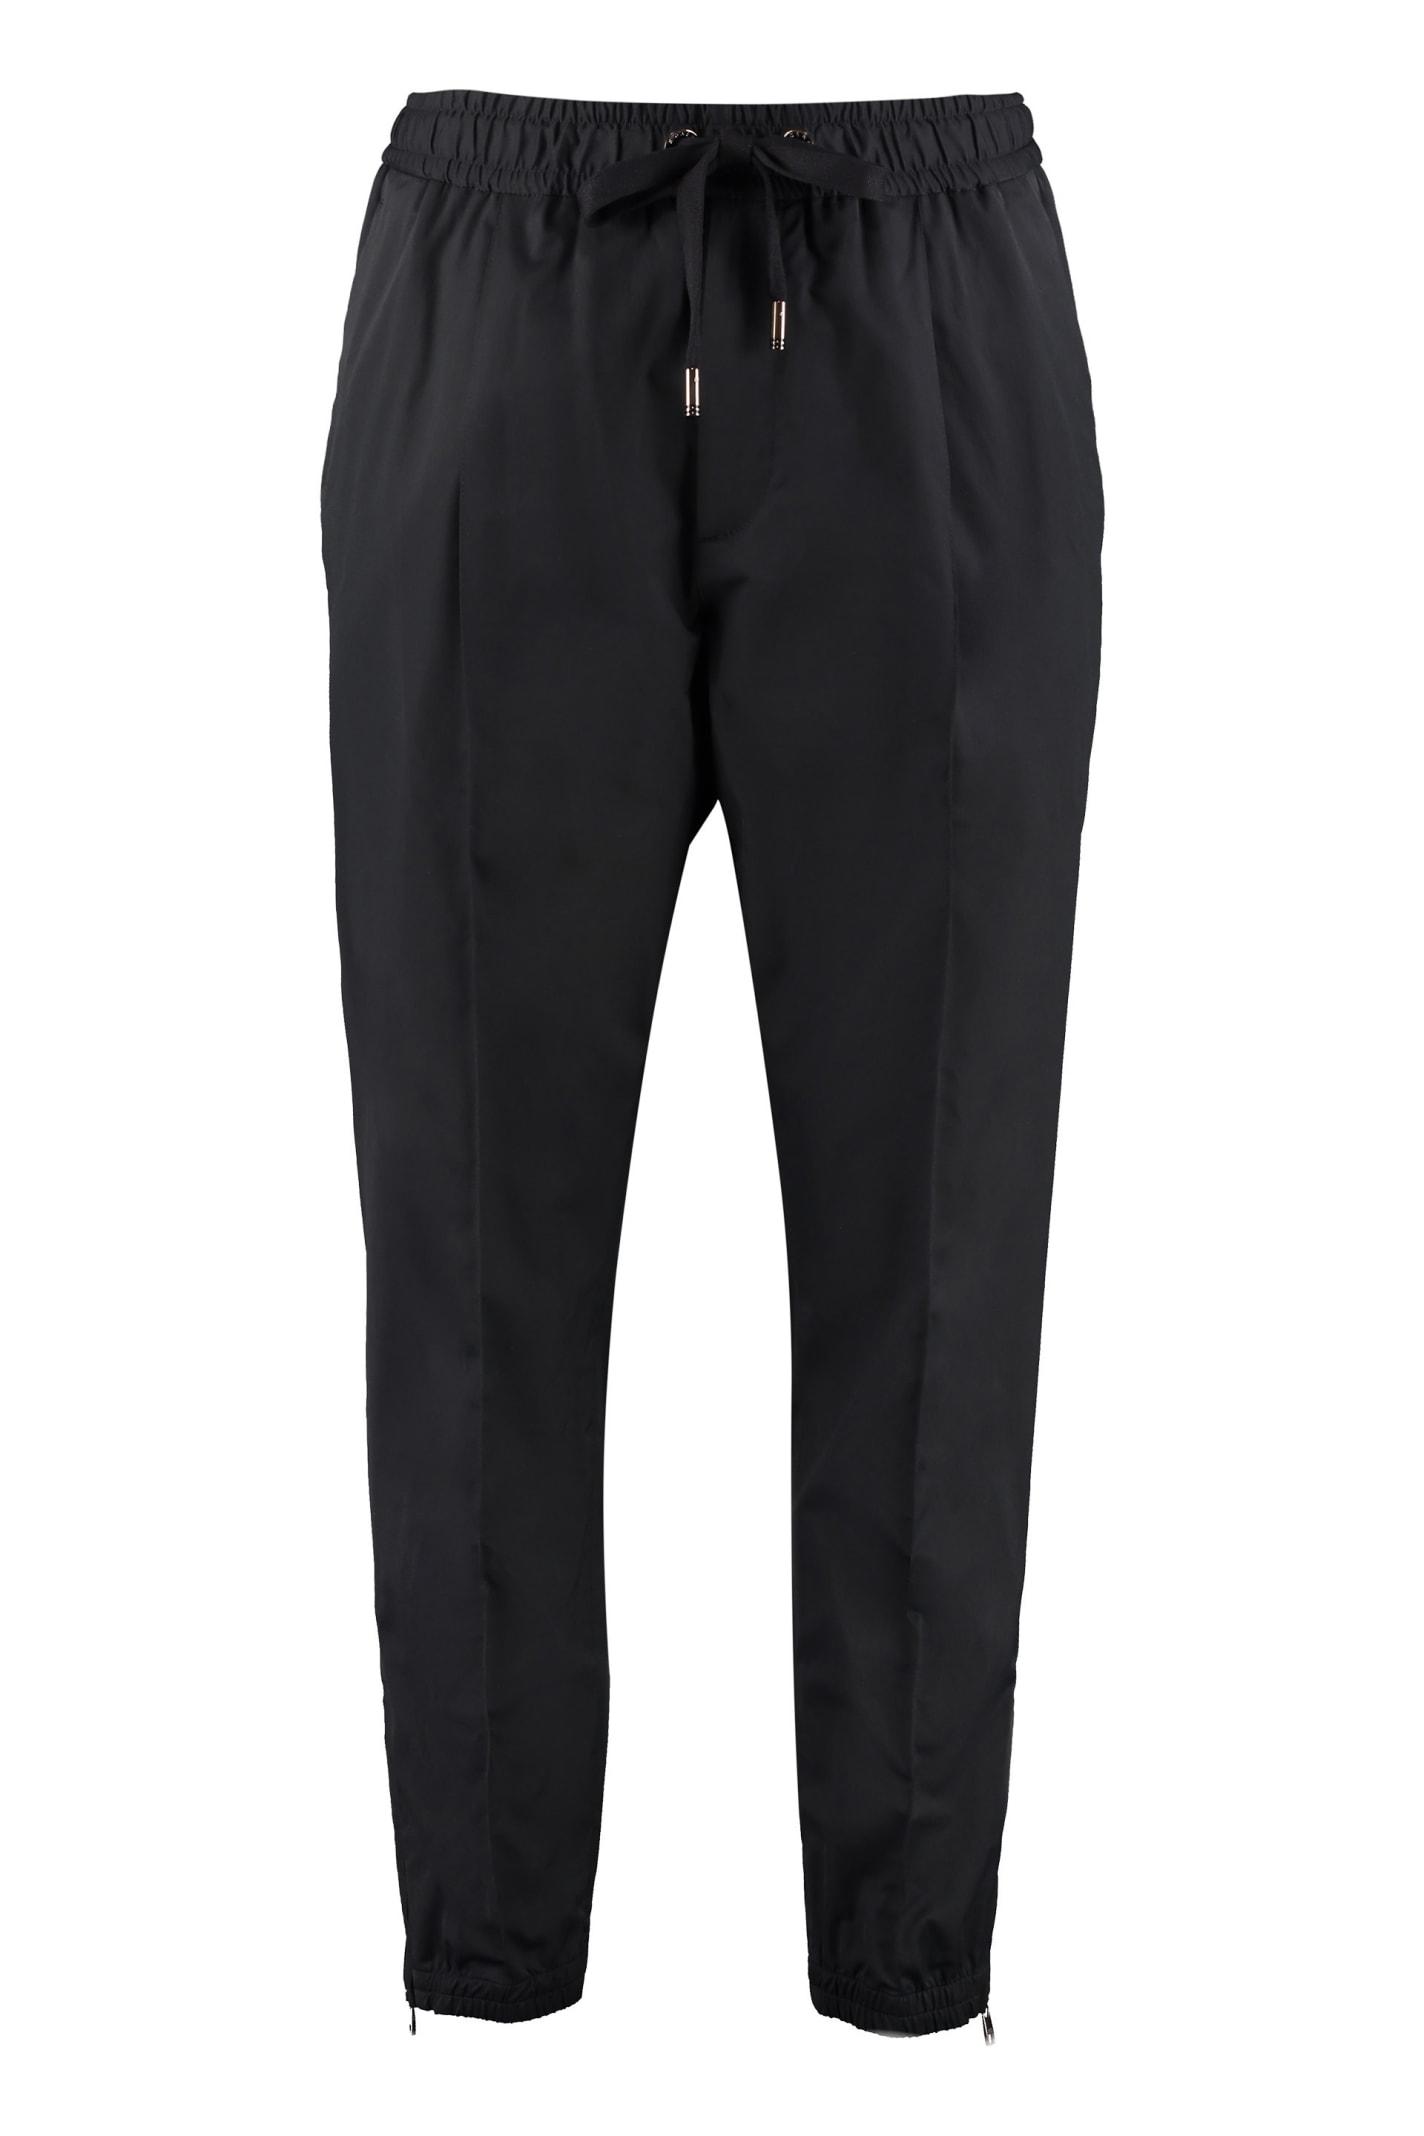 Dolce & Gabbana Techno Fabric Track Pants